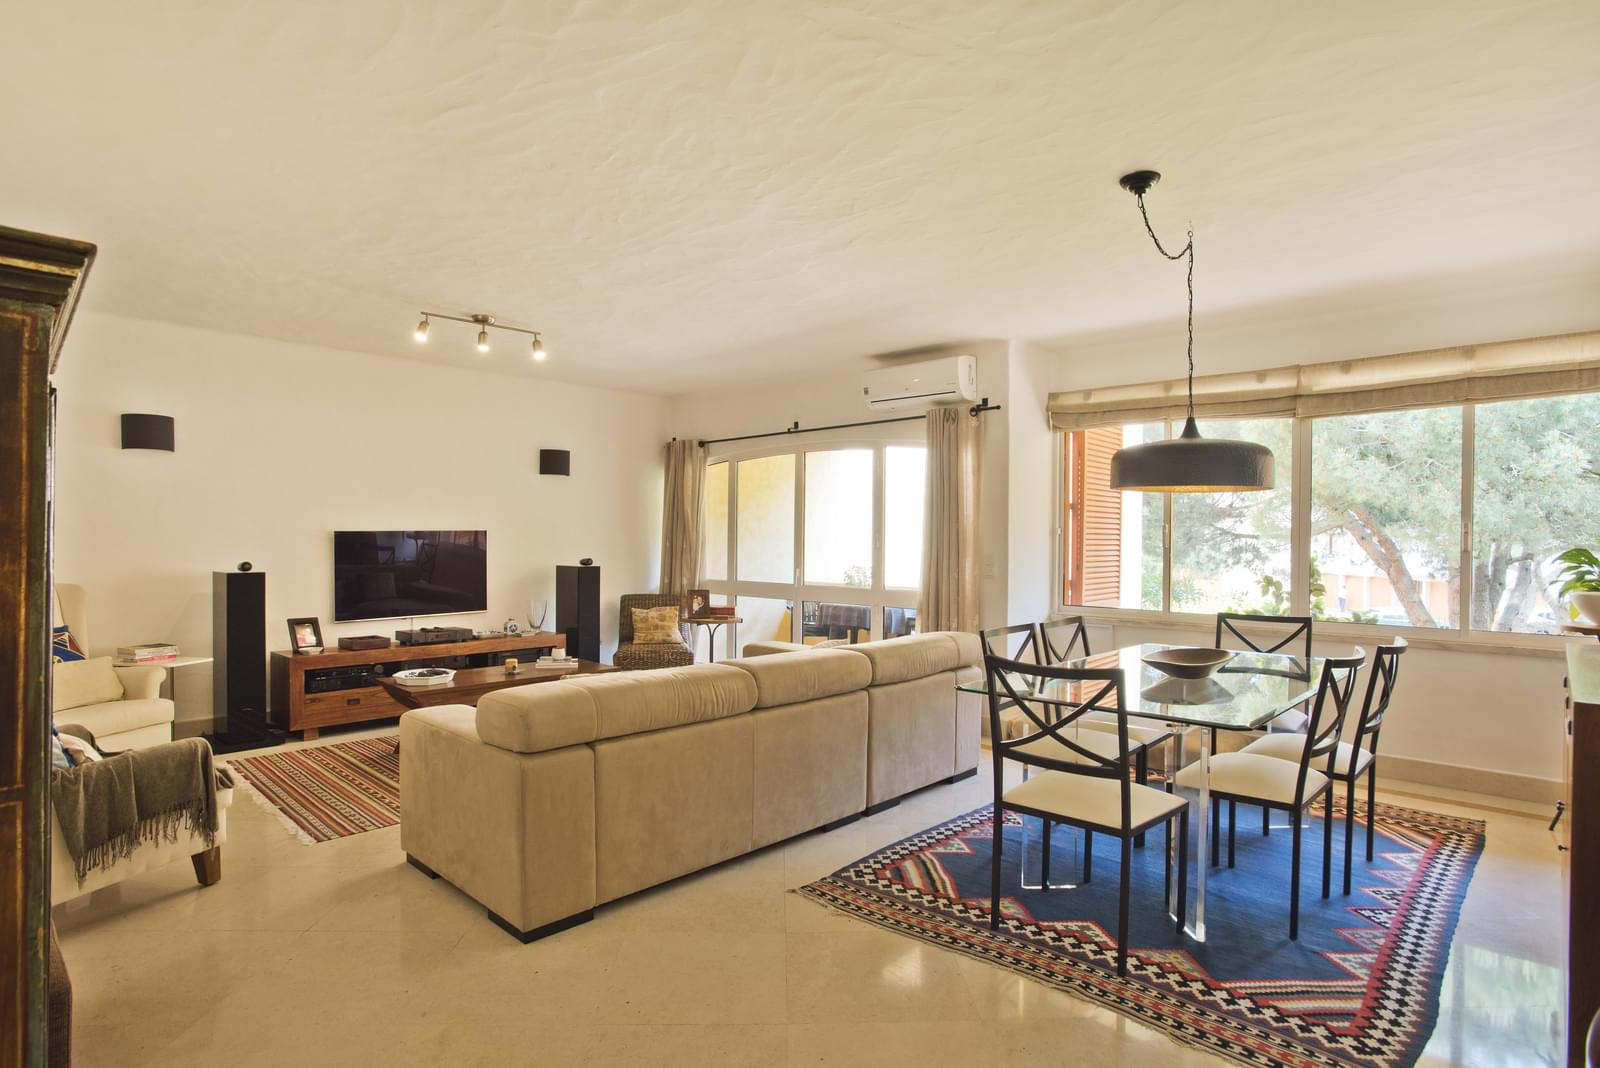 pf17230-apartamento-t3-cascais-2f8a346f-444b-4d1c-8955-070ba54759b7